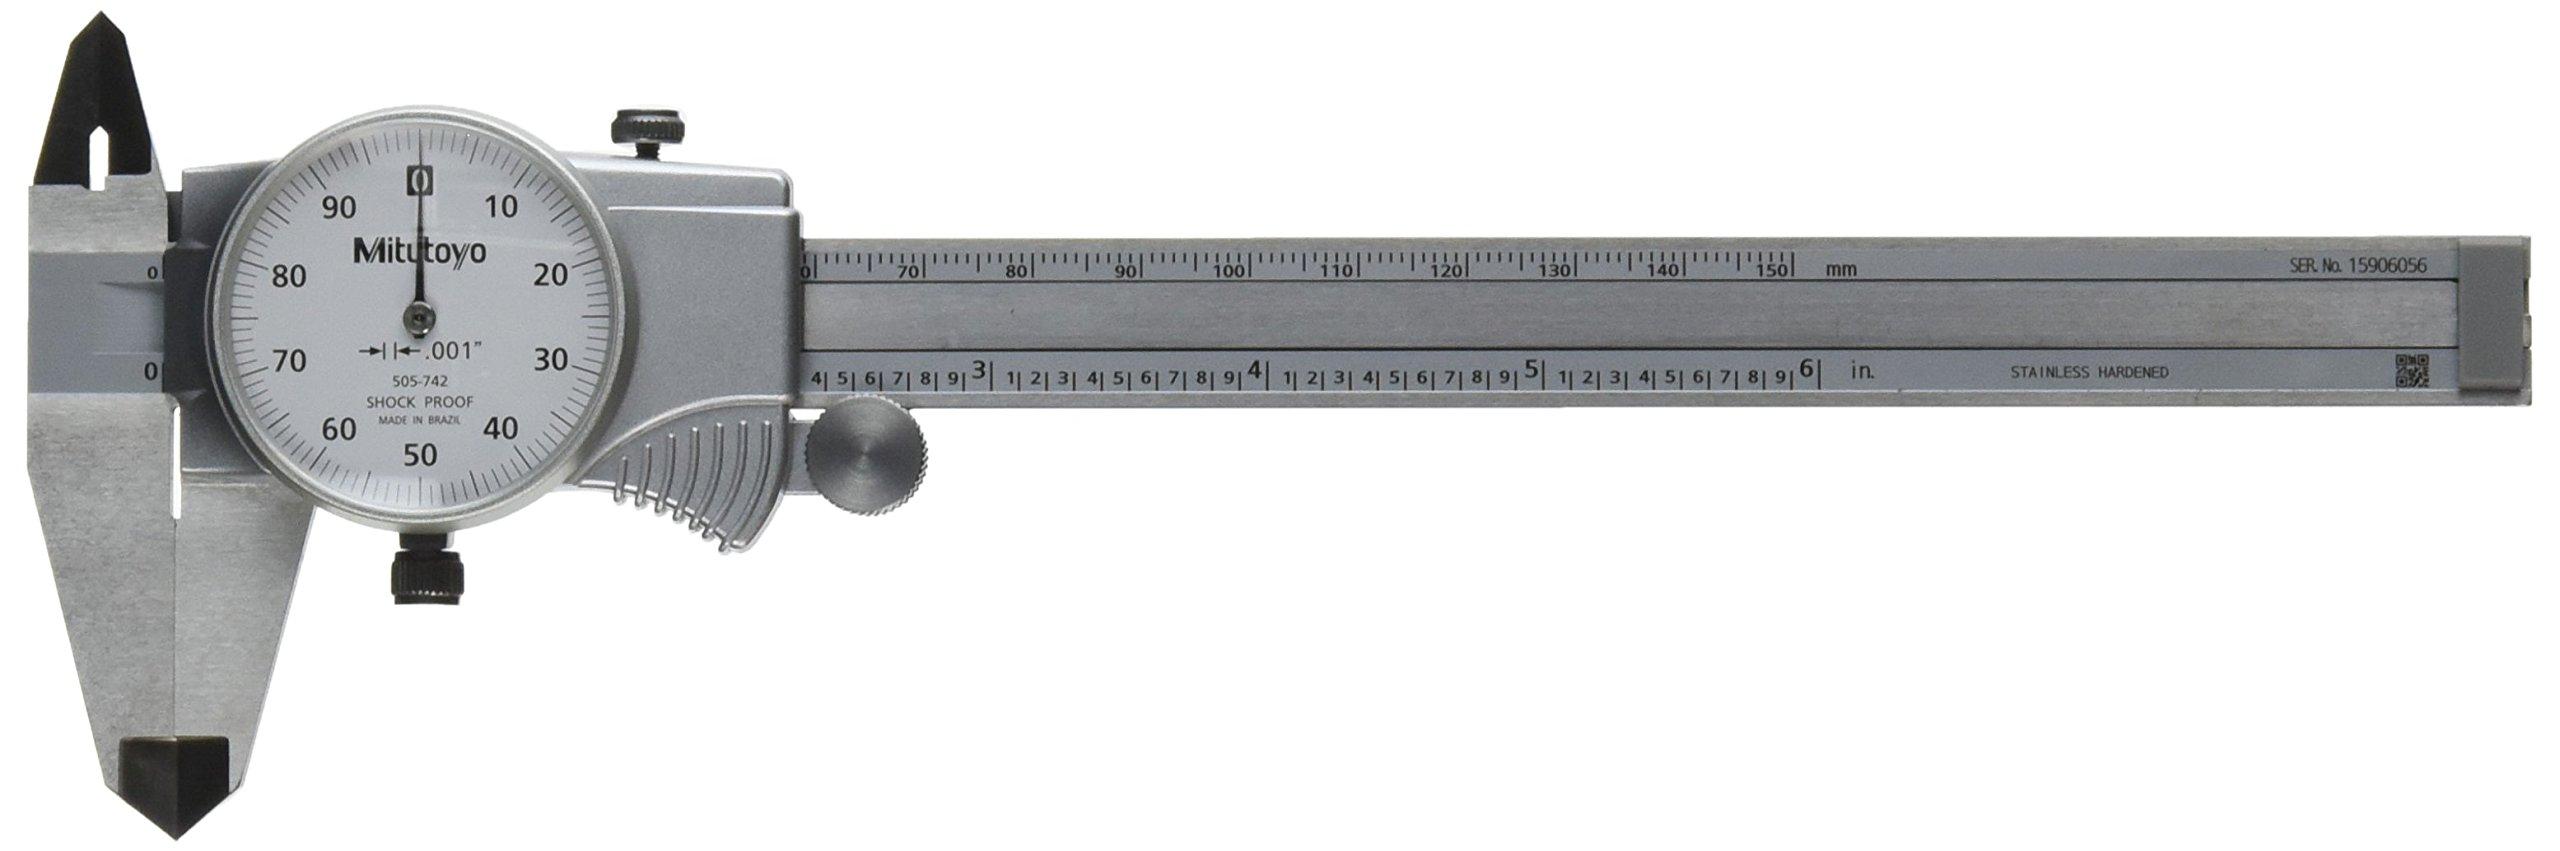 Mitutoyo 505-742 Dial Caliper, D6''TX, 0.1'' per Rev, 0-6'' Range, 0.001'' Accuracy by Mitutoyo